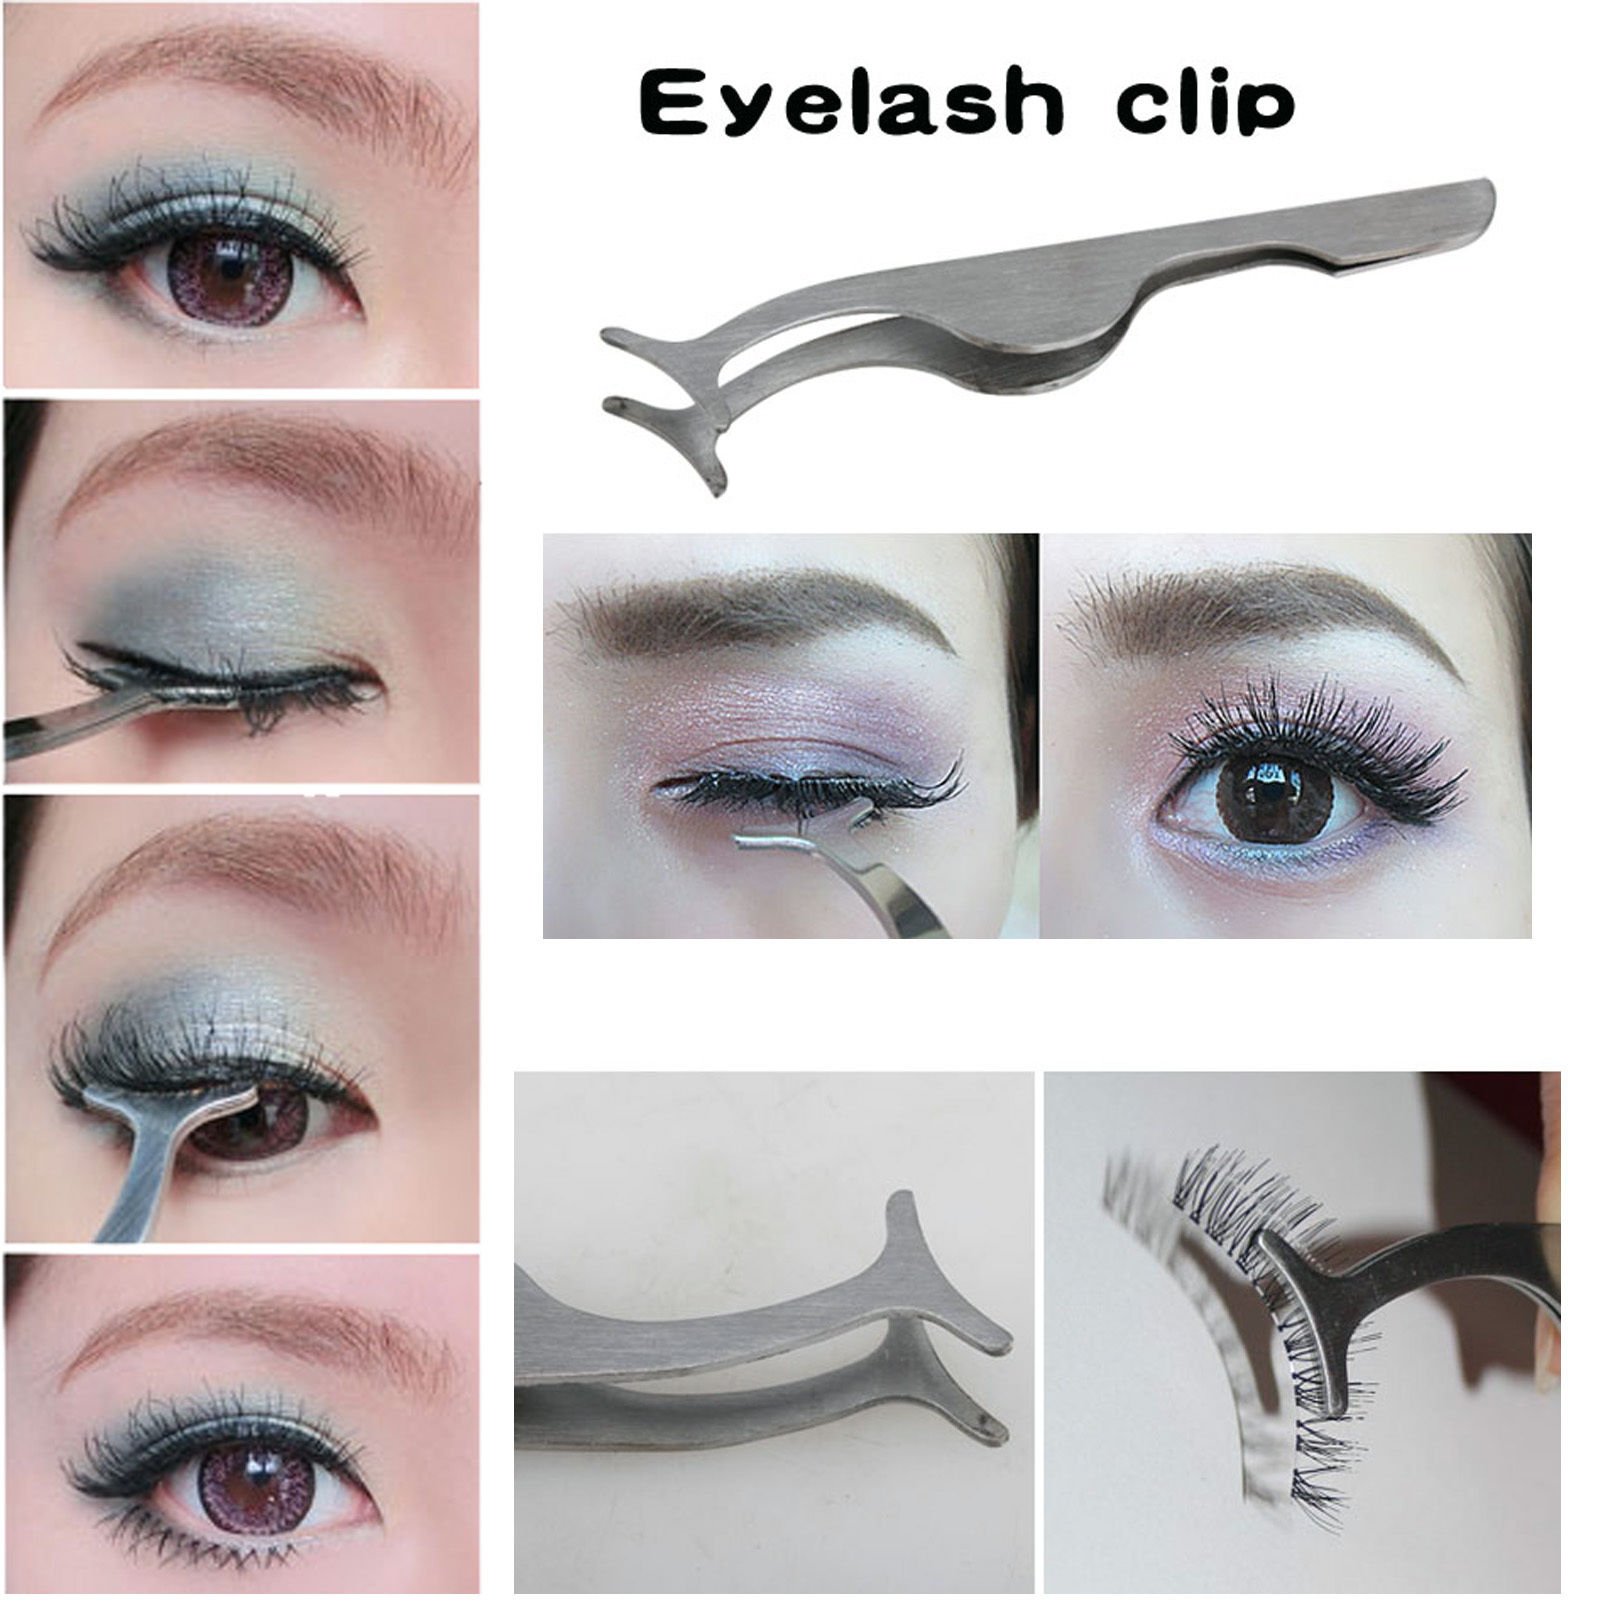 743e49cedb9 1.05AUD - Hot Beauty False Eyelashes Extension Applicator Remover Clip  Tweezer Nipper Tool #ebay #Fashion